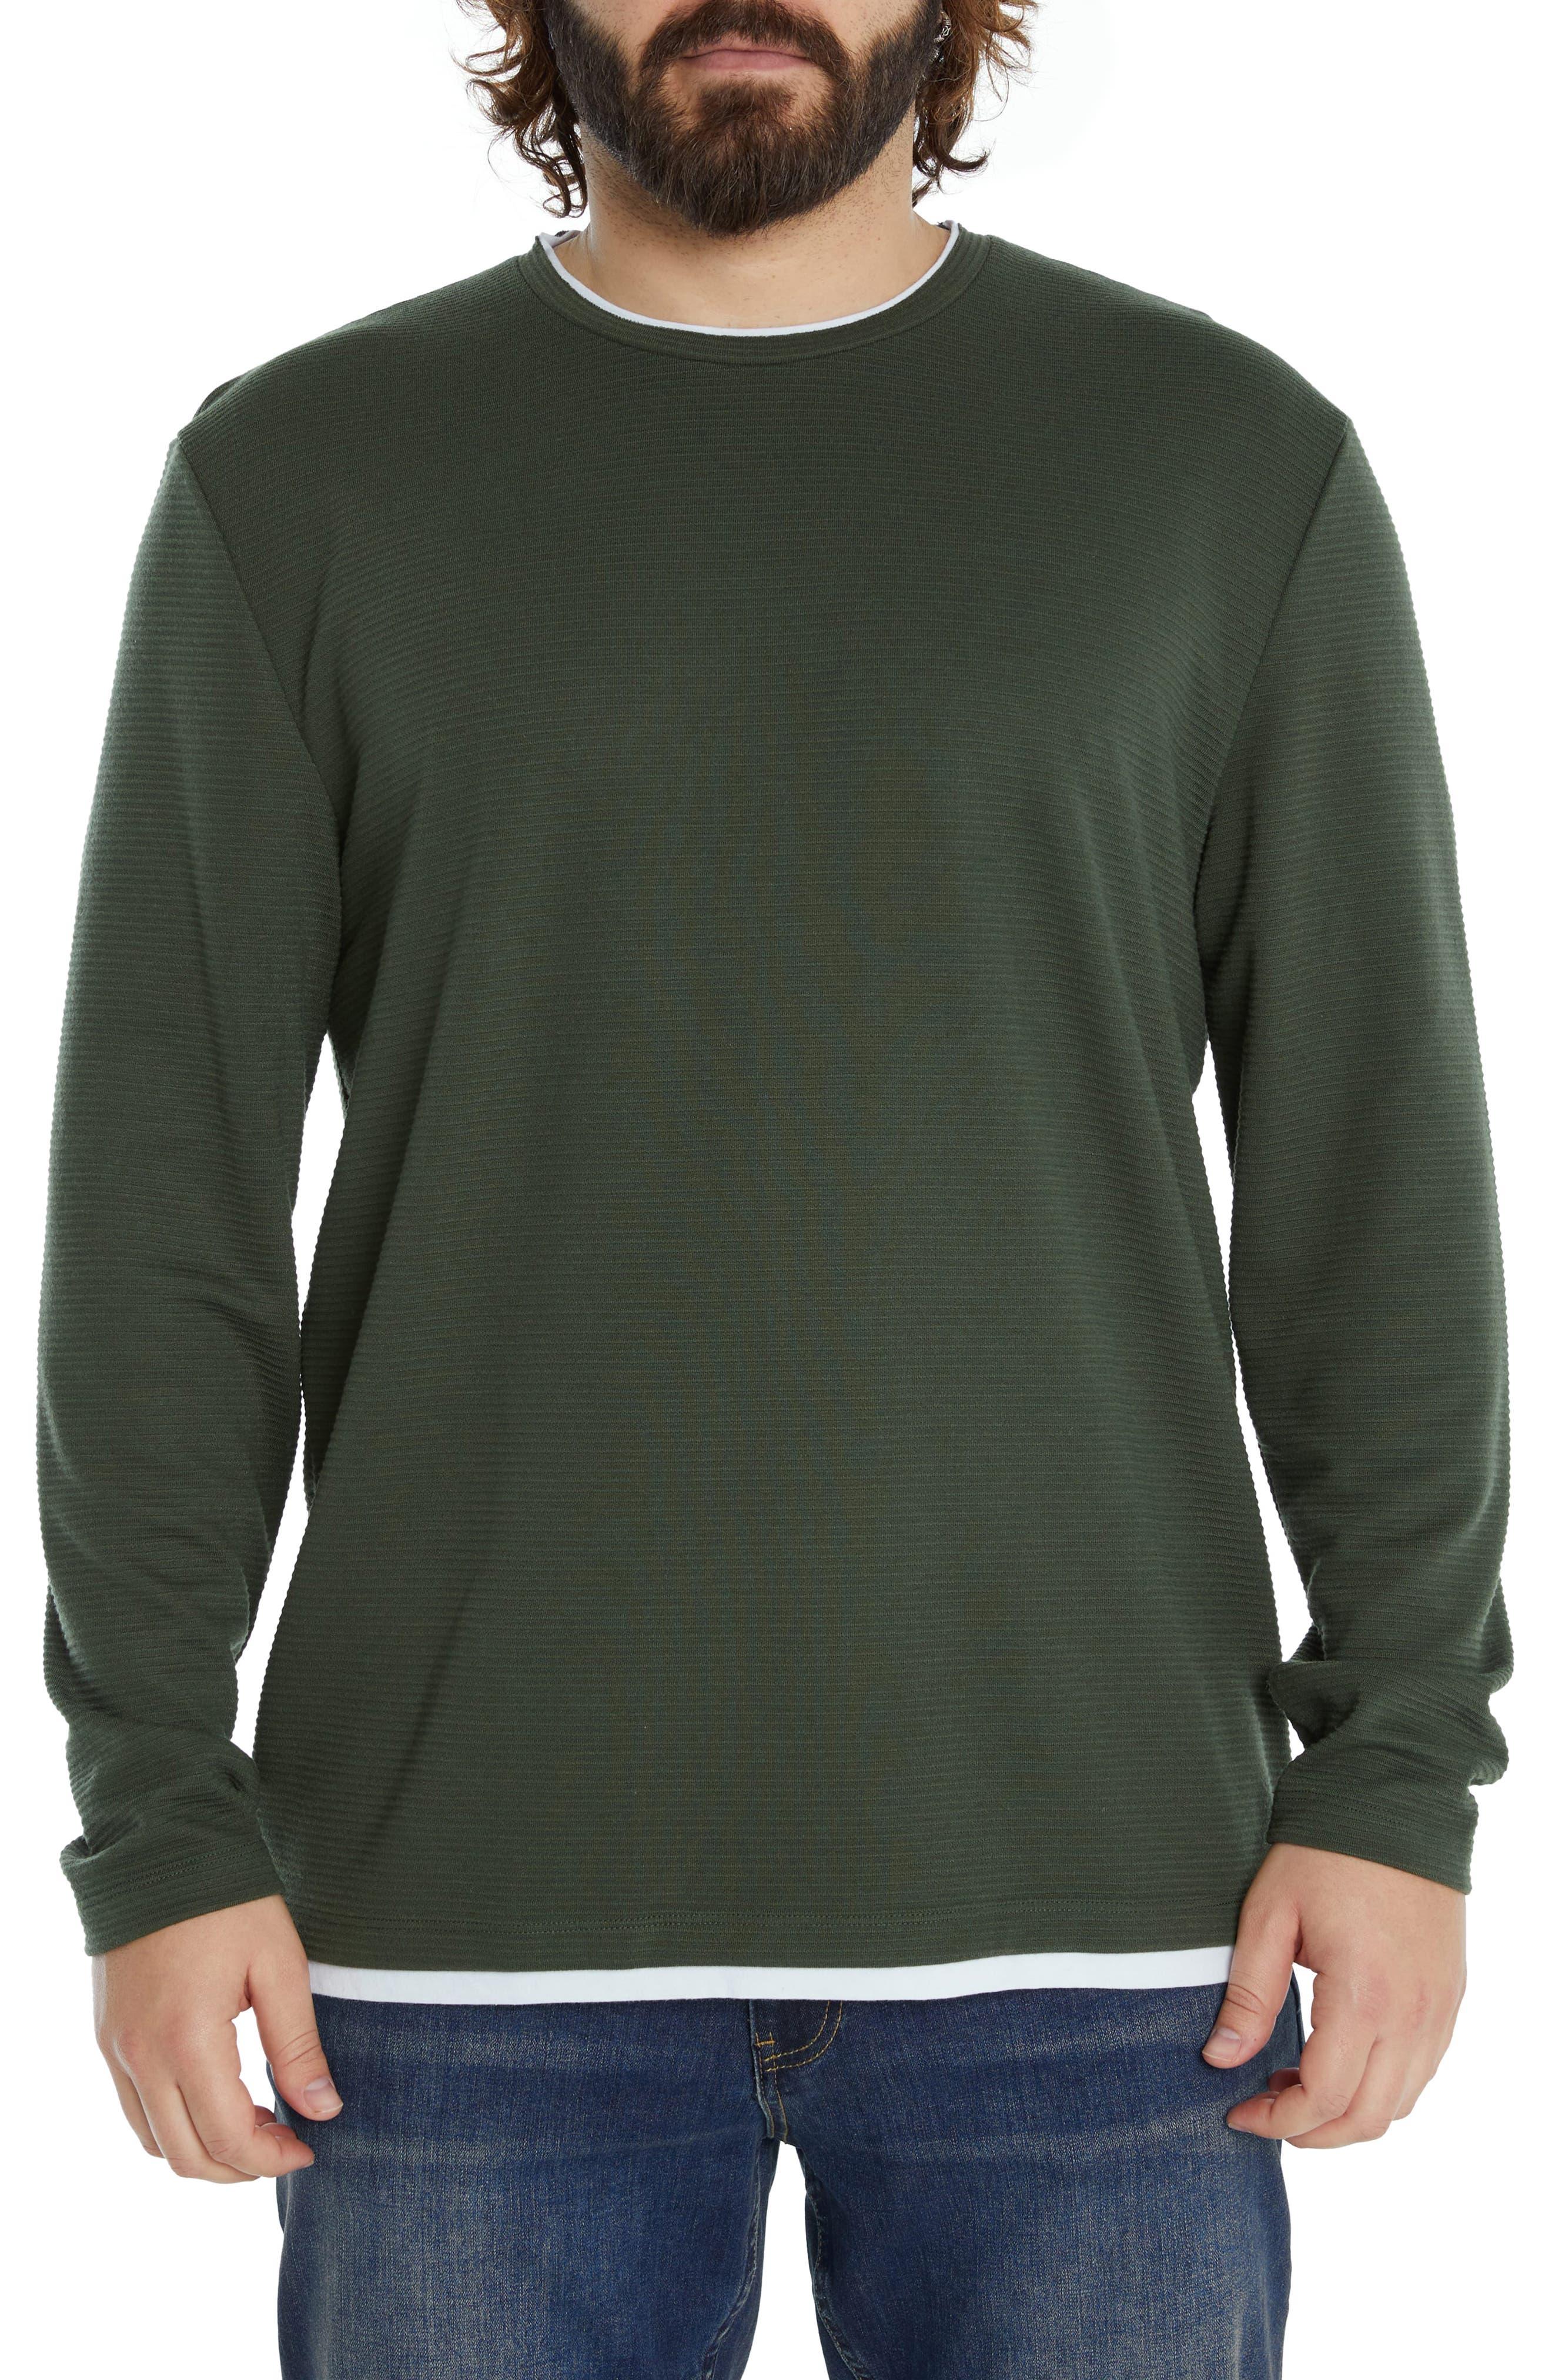 Layered Look Sweatshirt